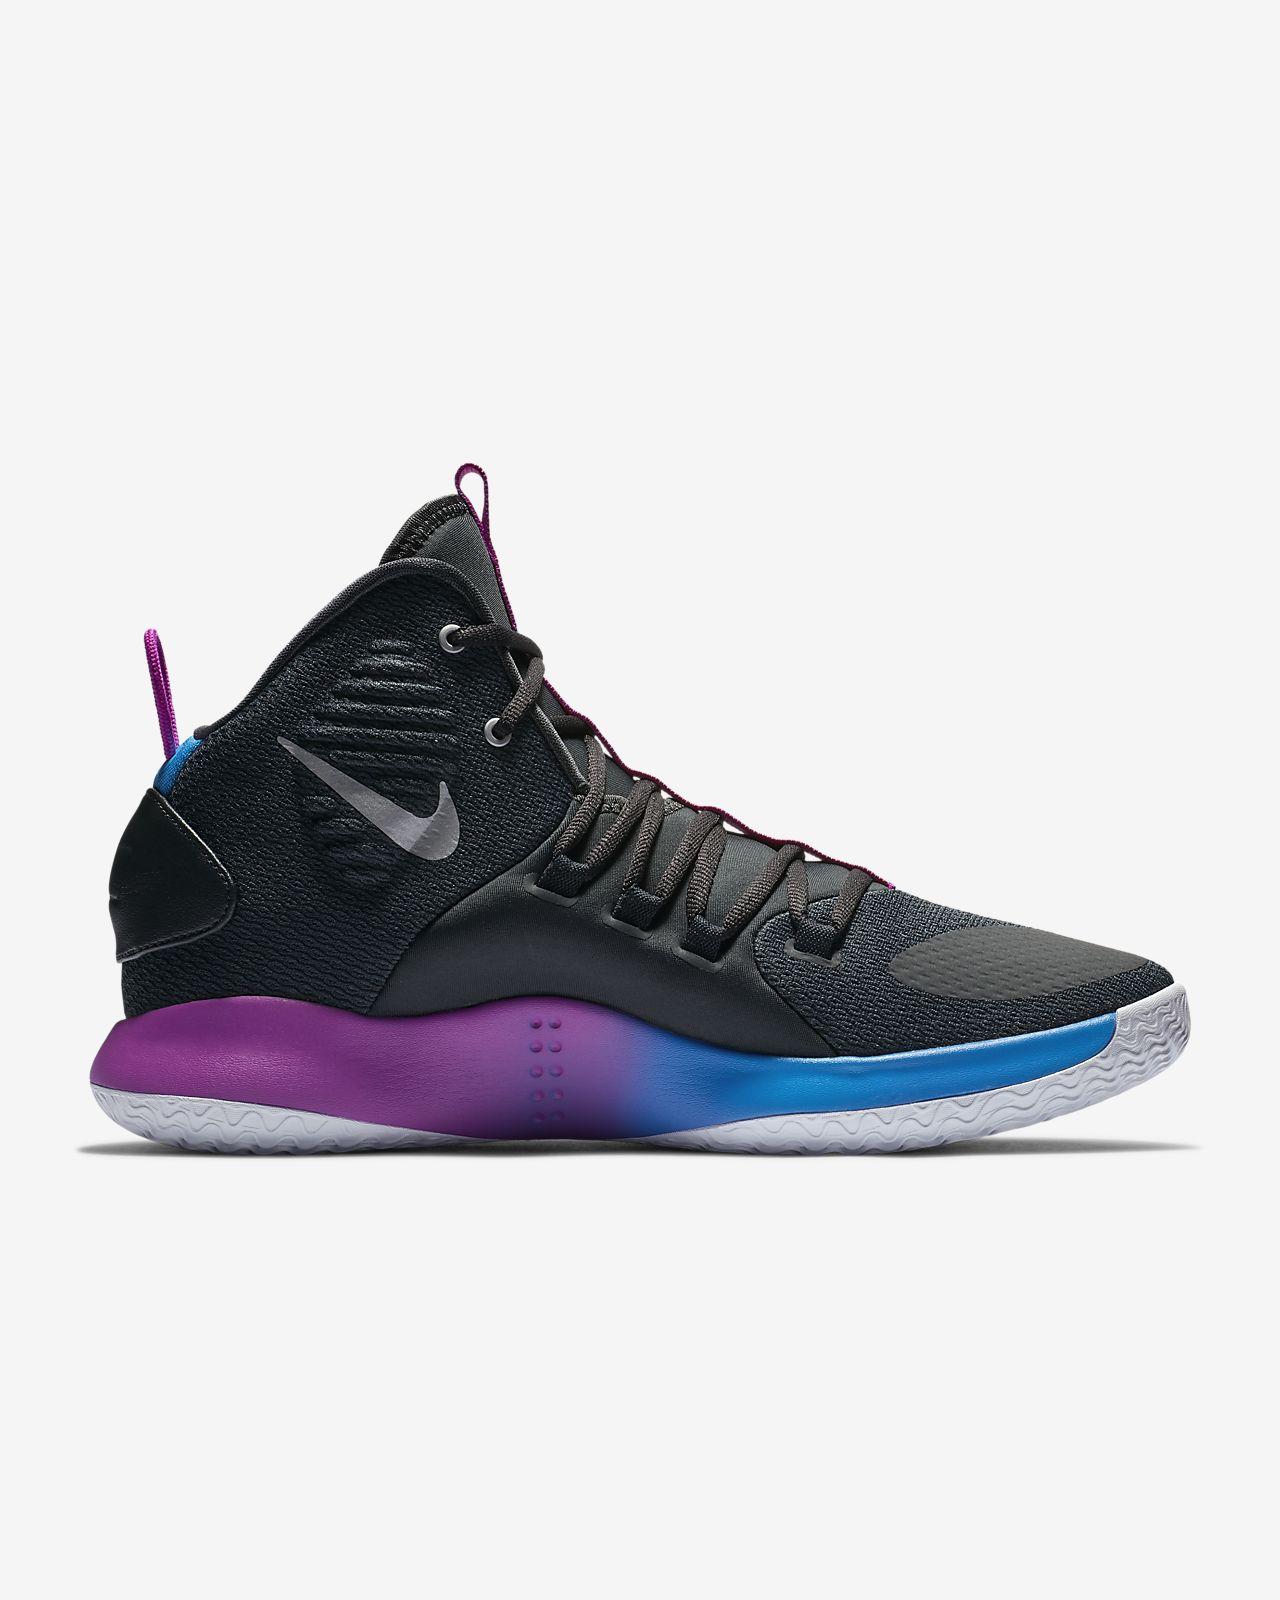 59dde614f649 Low Resolution Nike Hyperdunk X Basketball Shoe Nike Hyperdunk X Basketball  Shoe